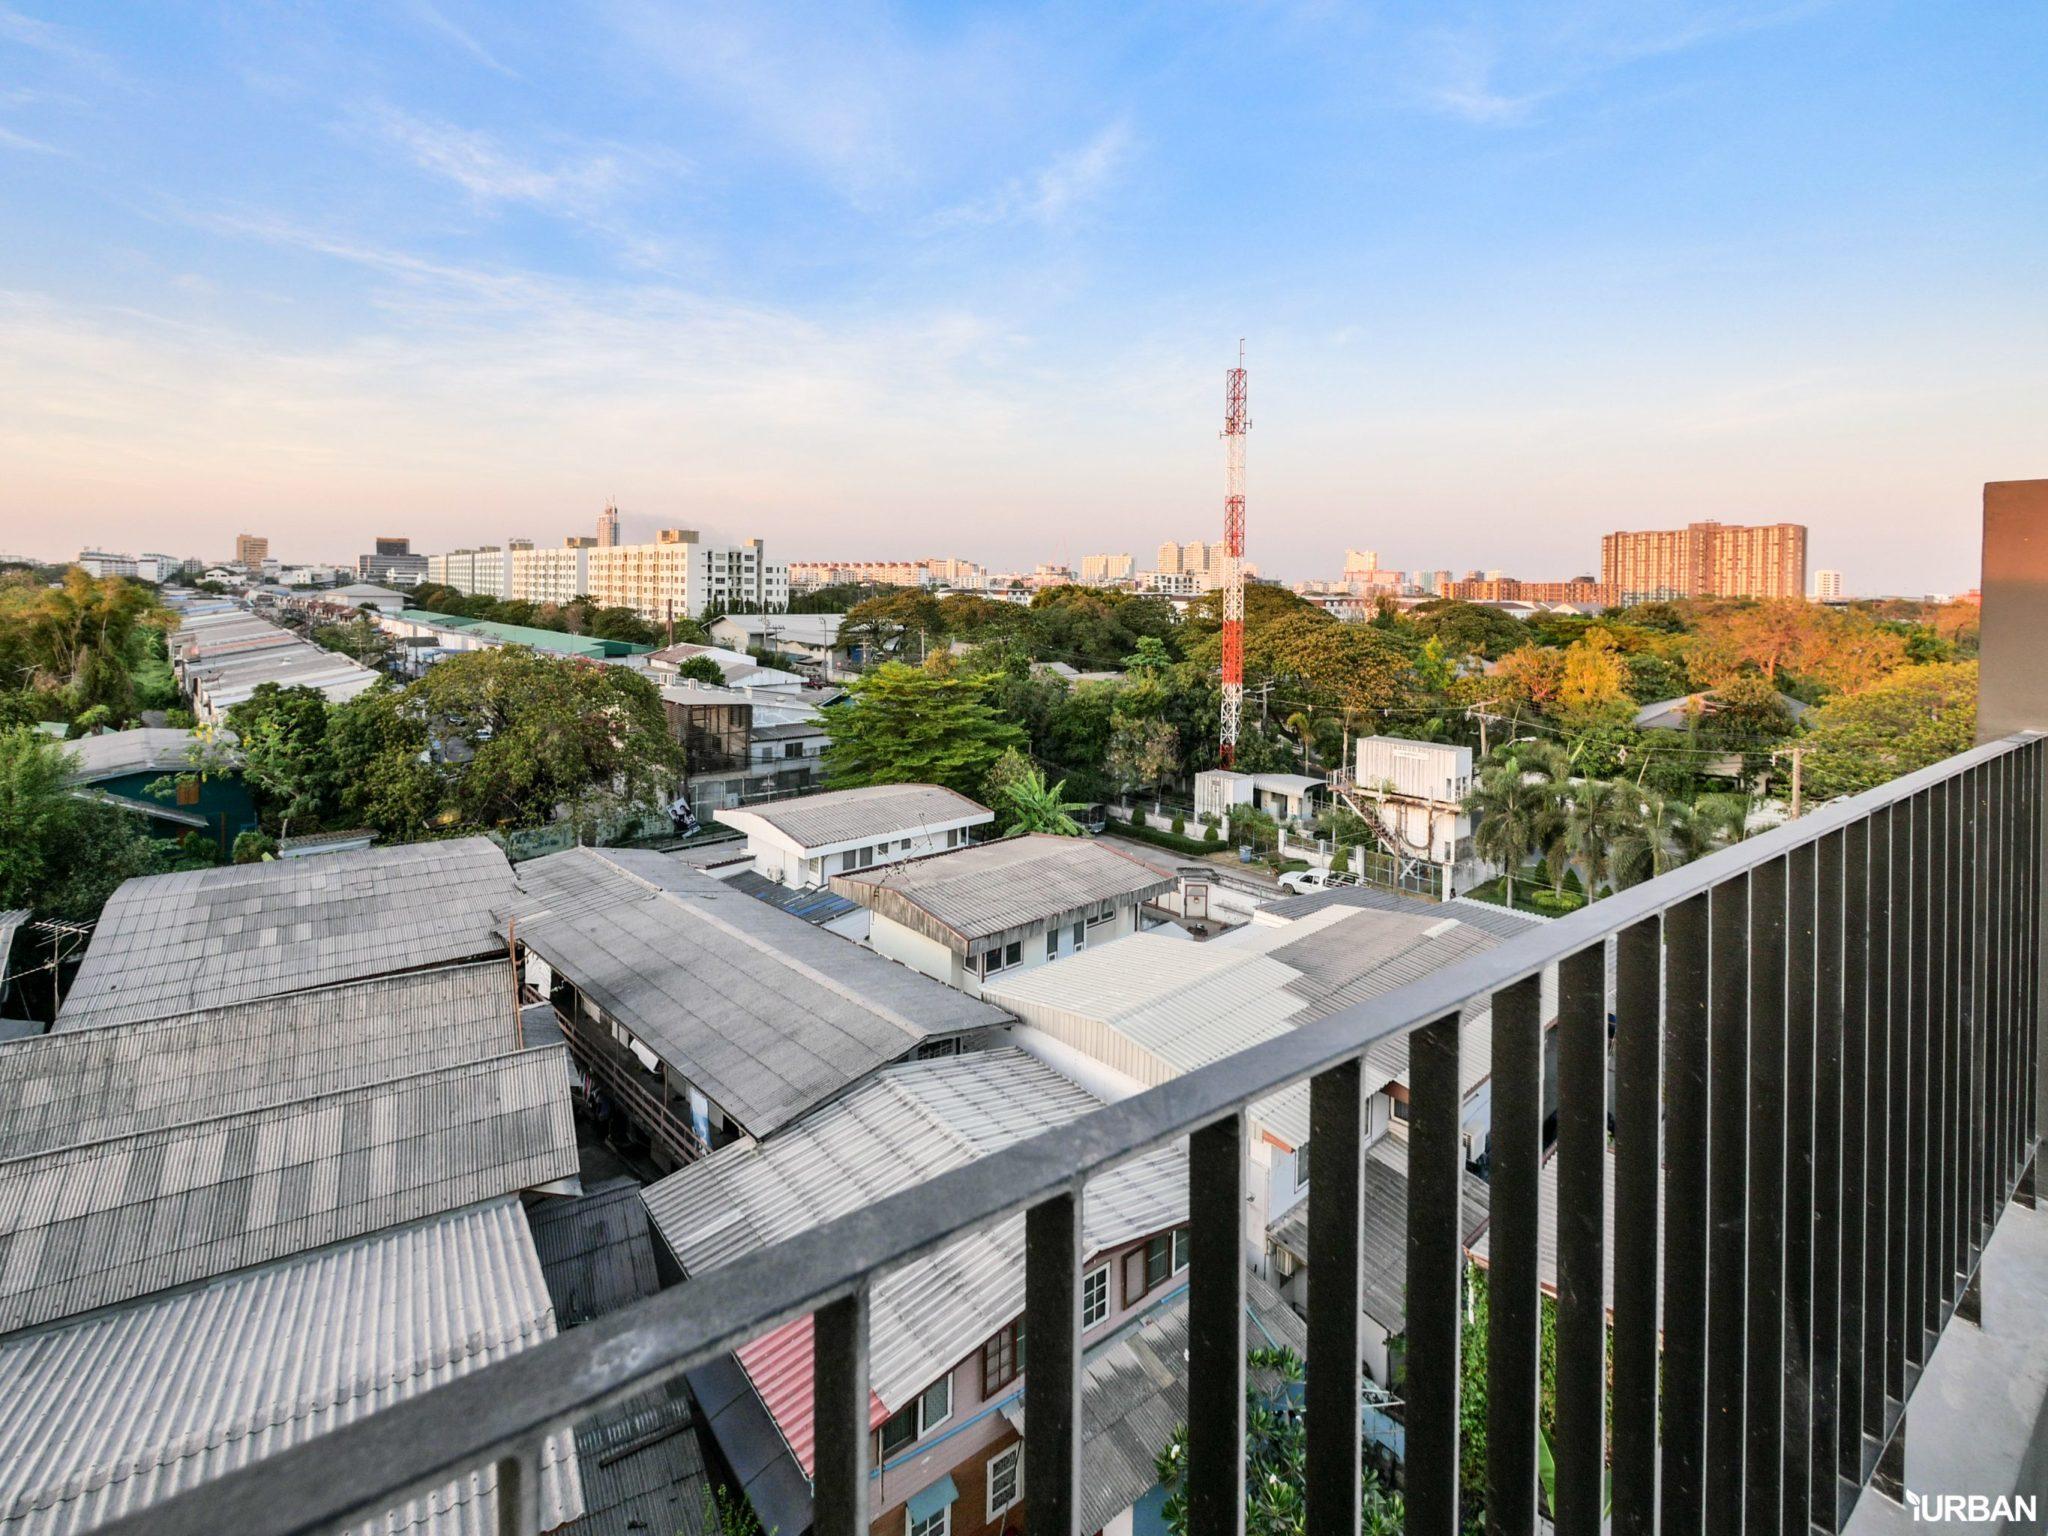 AIRES RAMA9 รีวิว Luxury Townhome 3.5 ชั้น + Rooftop ออกแบบสวย ย่านพระราม9 (ใกล้ รพ.สมิติเวช) 89 - AIRES